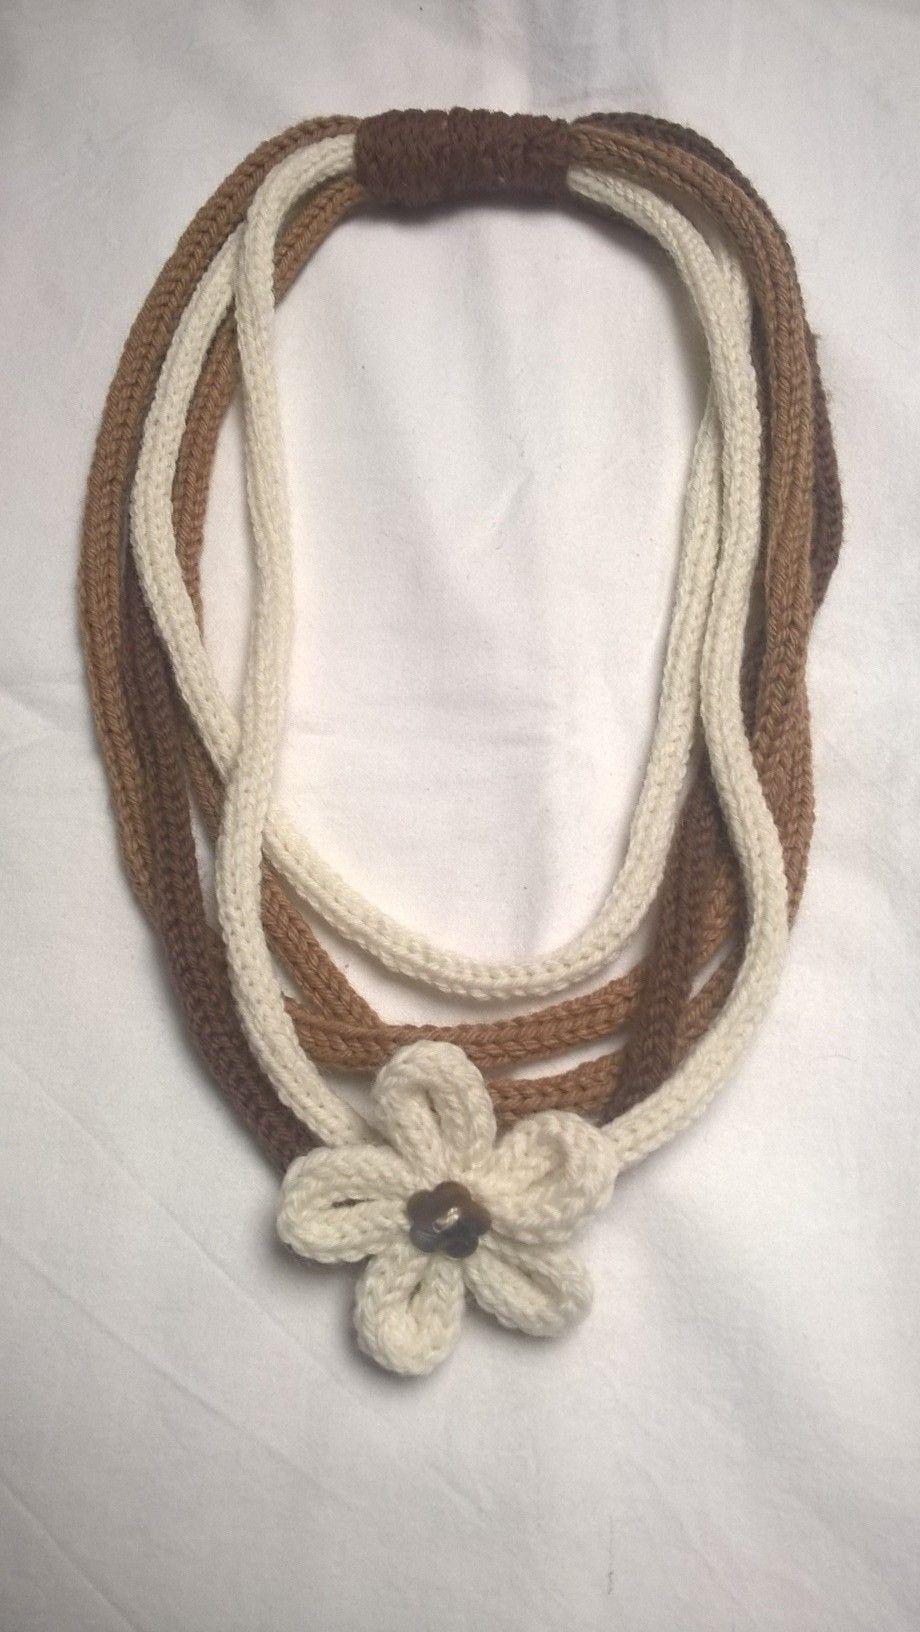 Pin by Voula Kyriakoudi on HOME | Pinterest | Crochet, Crochet ...